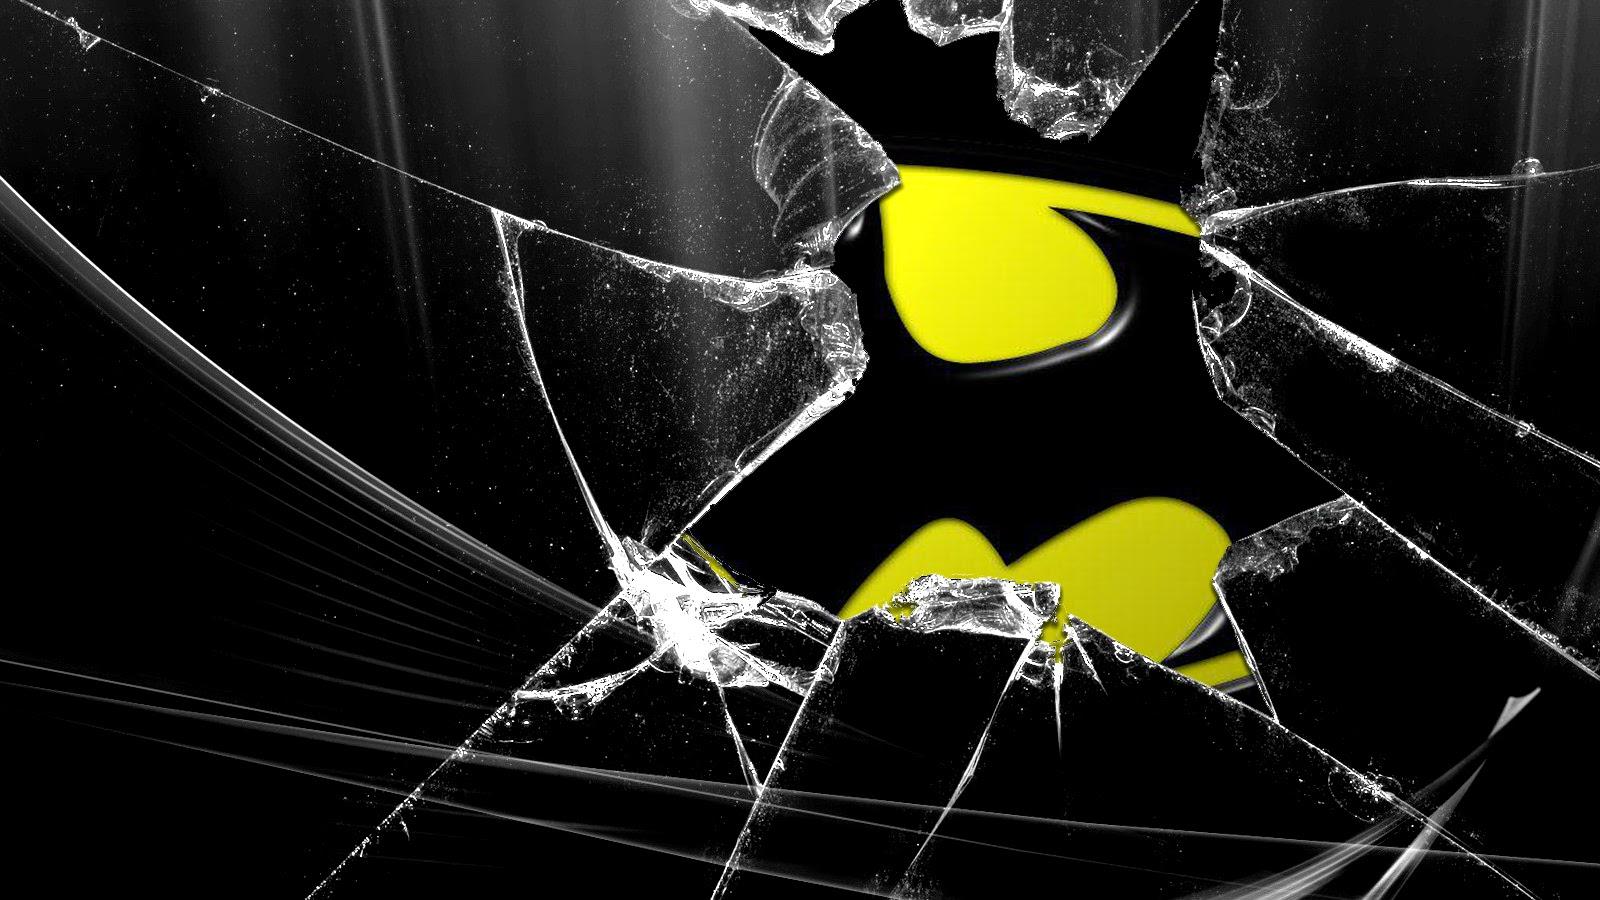 Transformers Wallpaper Hd For Android Wallpaper Hd Batman Cover Keren Untuk Desktop Pc